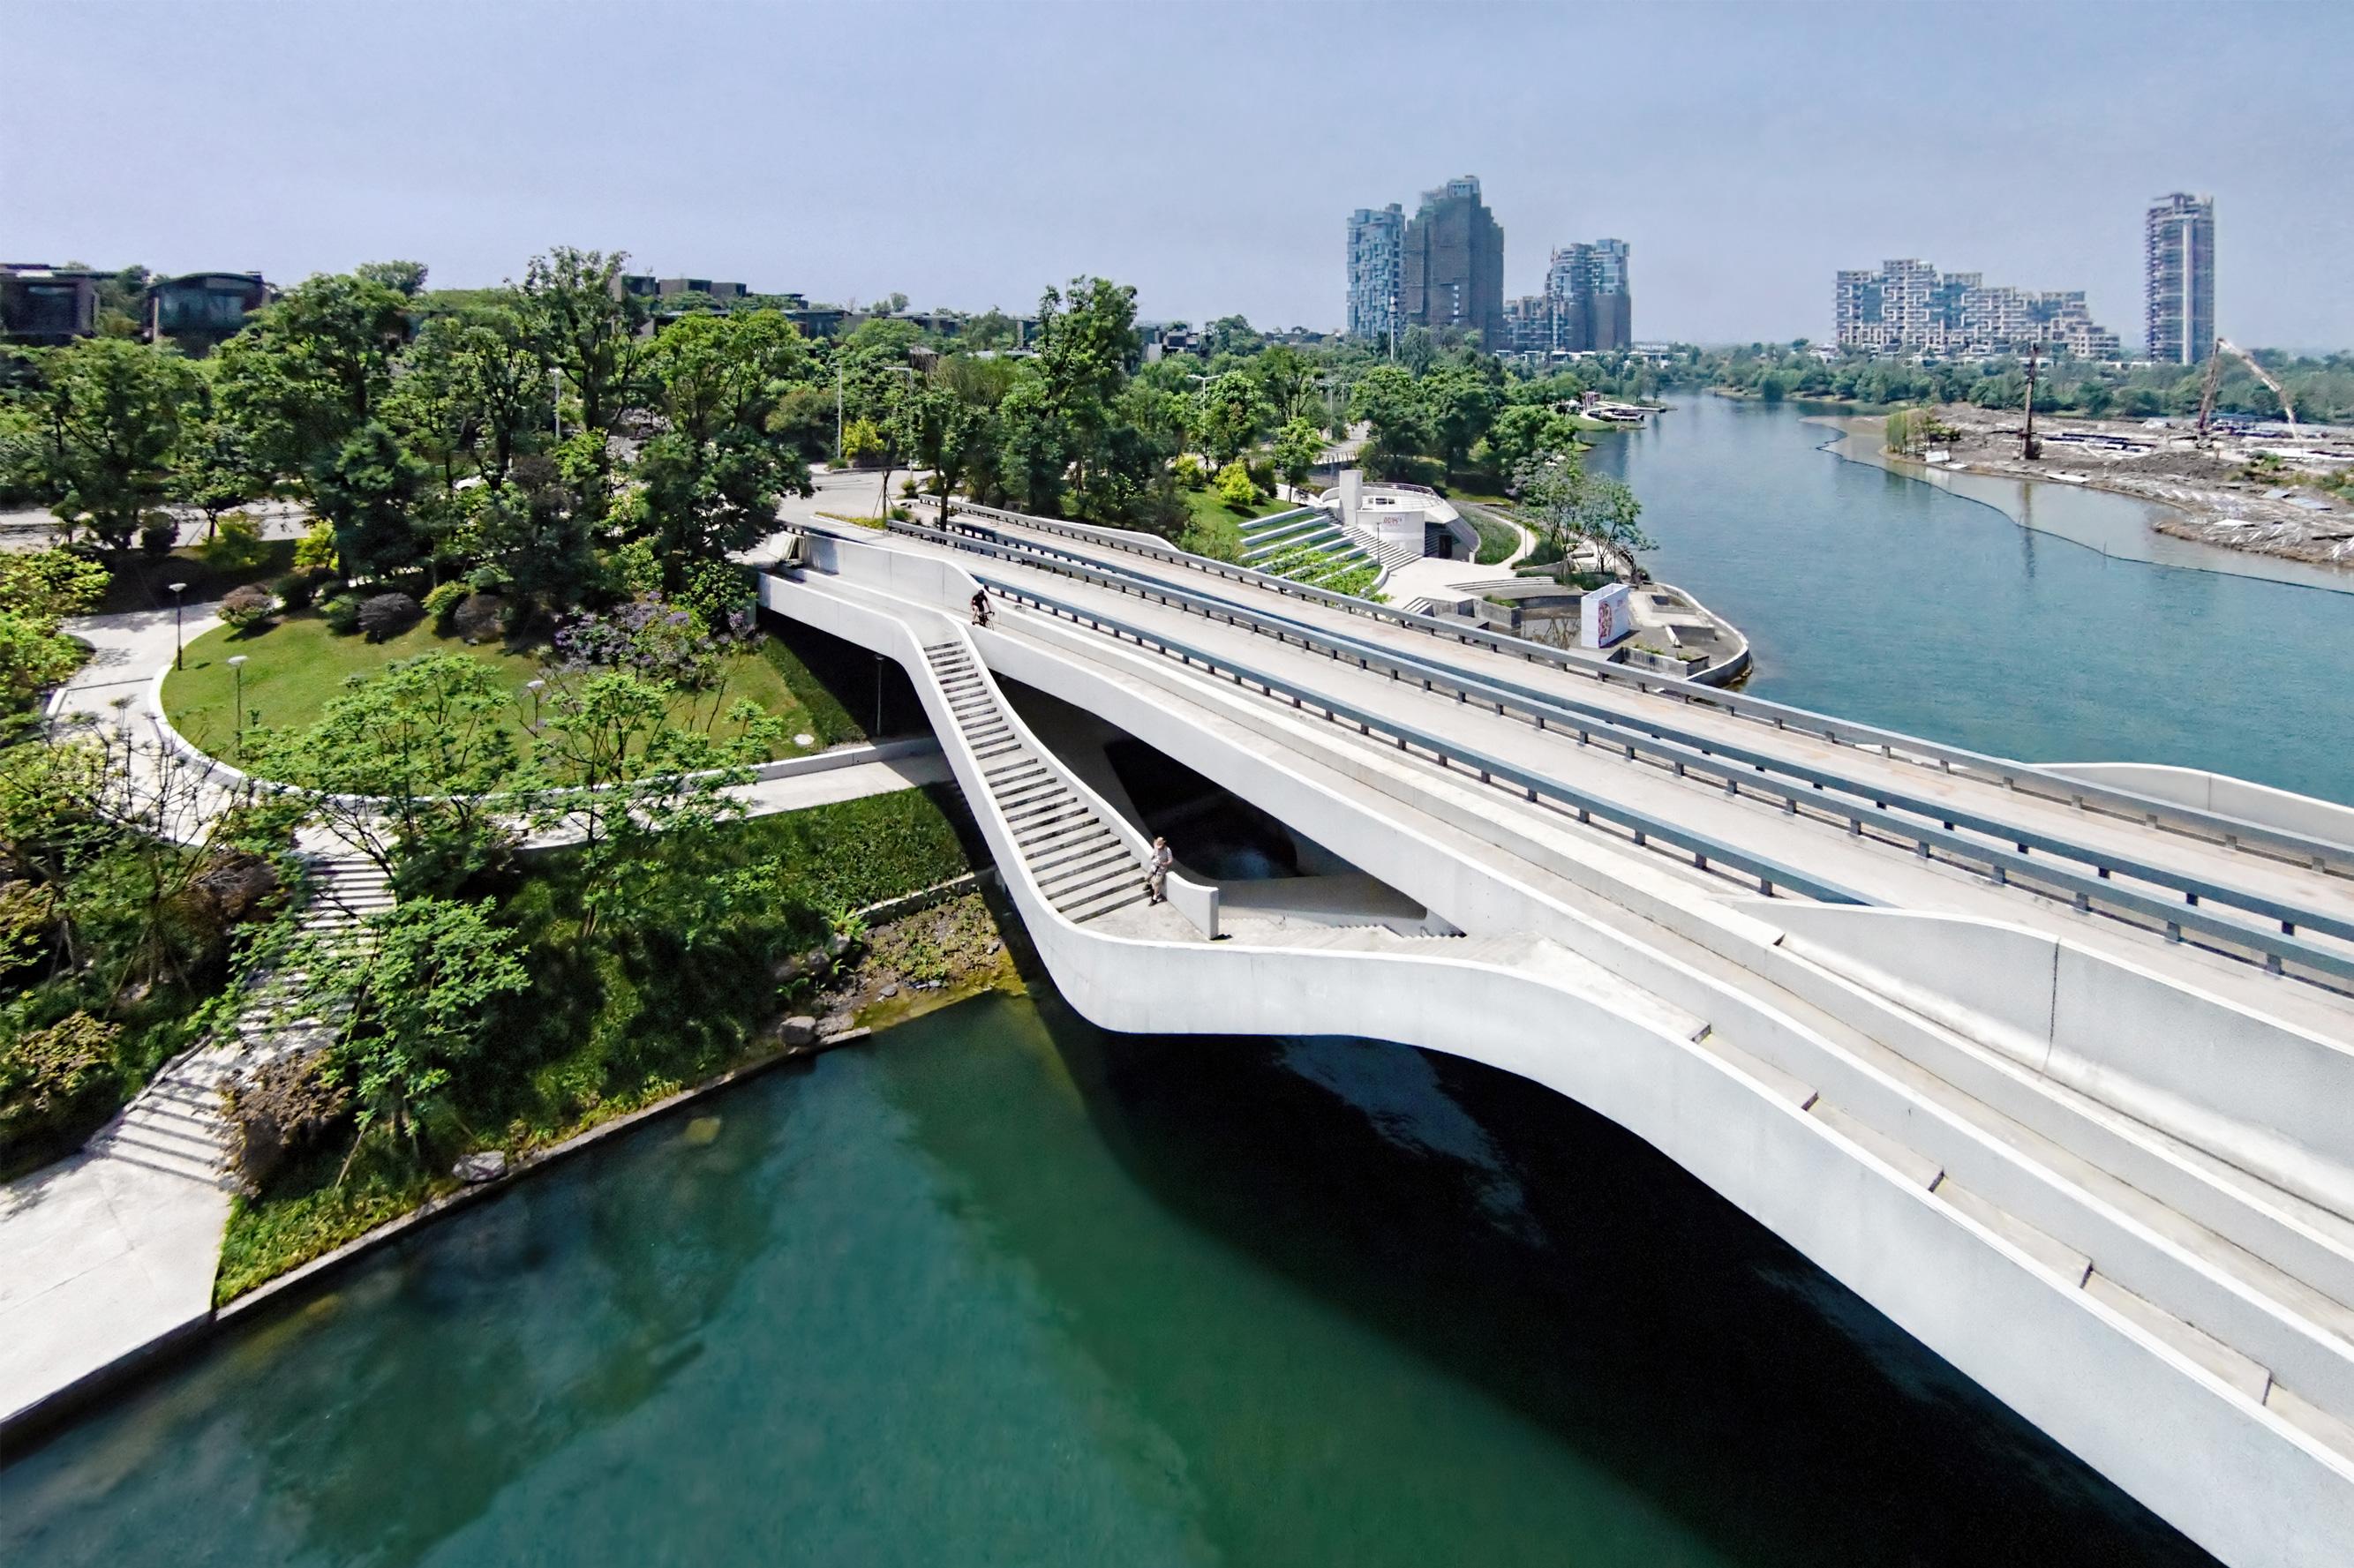 Urban bridge photo